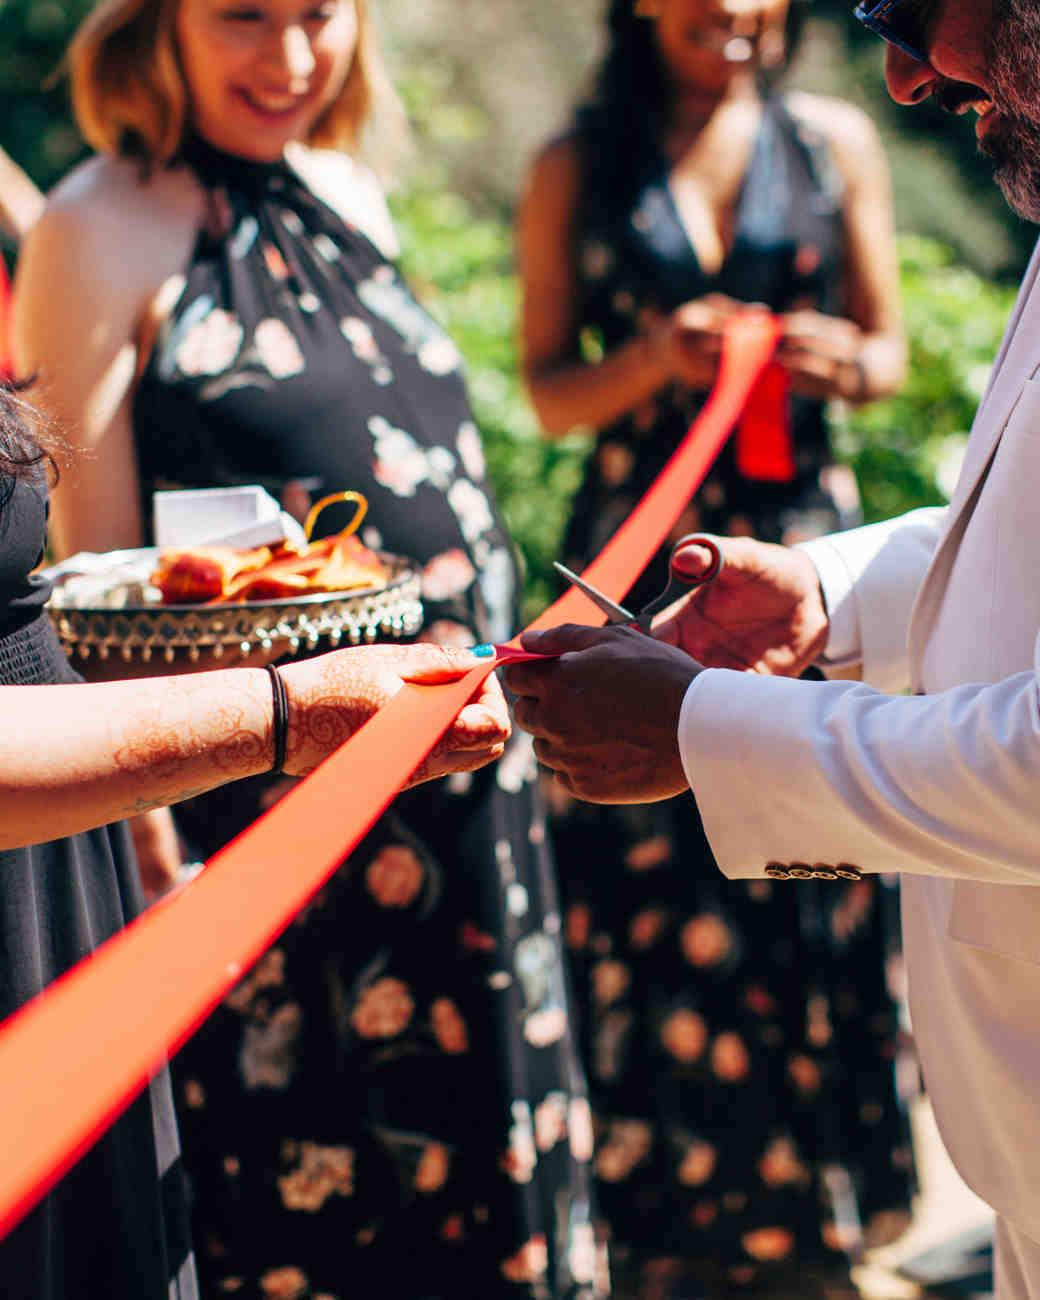 rosie-ambi-wedding-ribbon-2662-s112501-0116.jpg